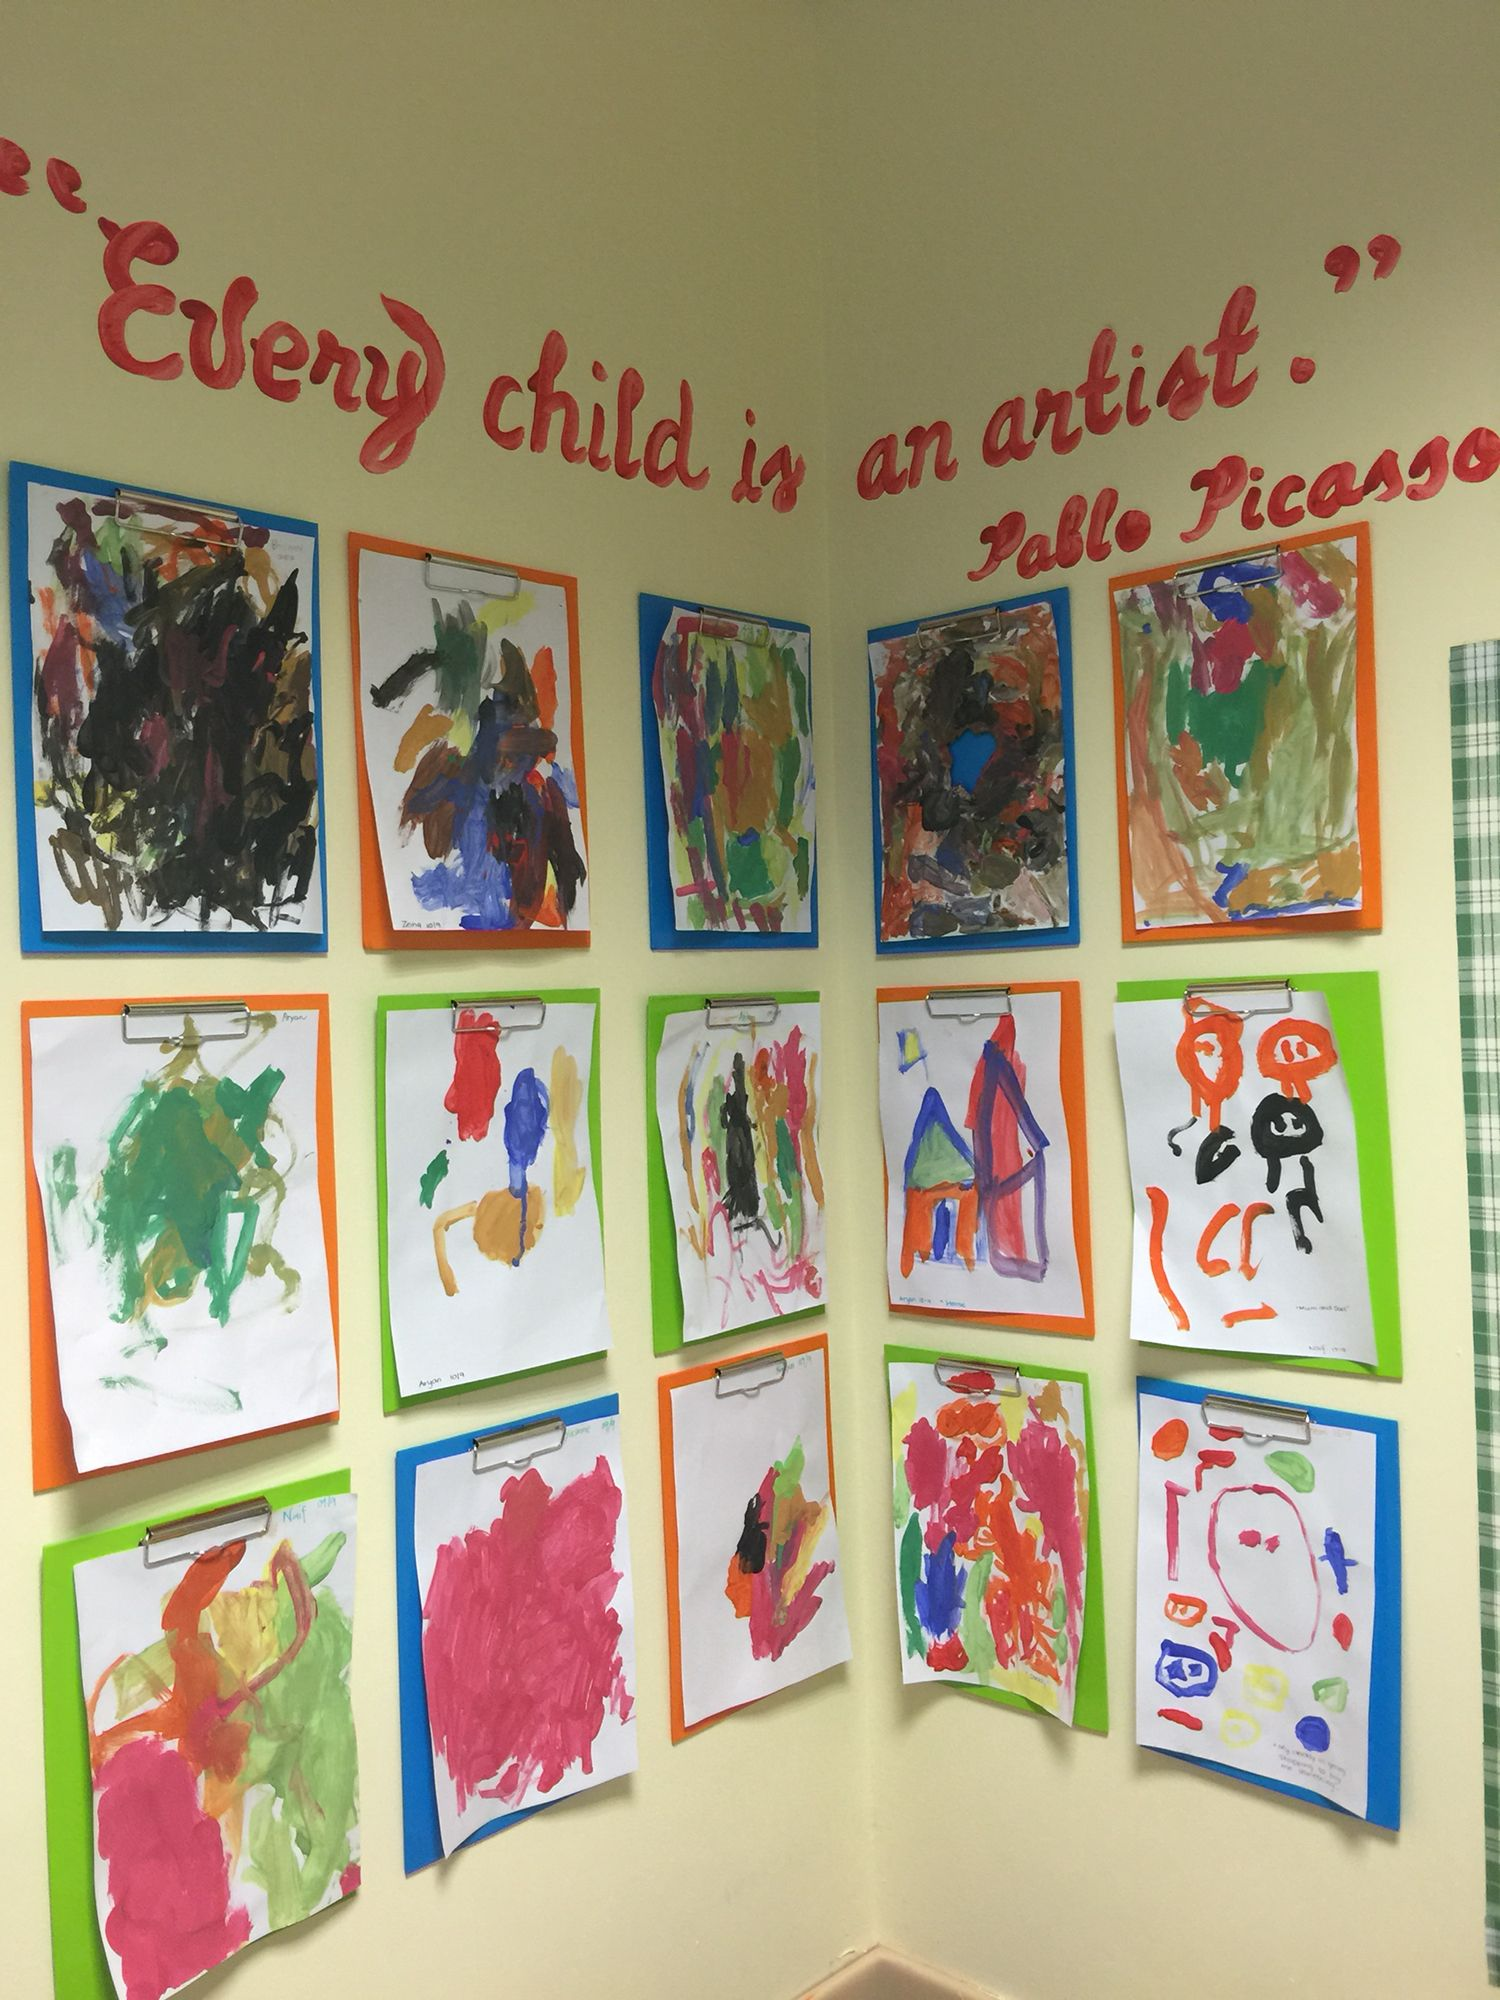 Every child is an artist art corner display